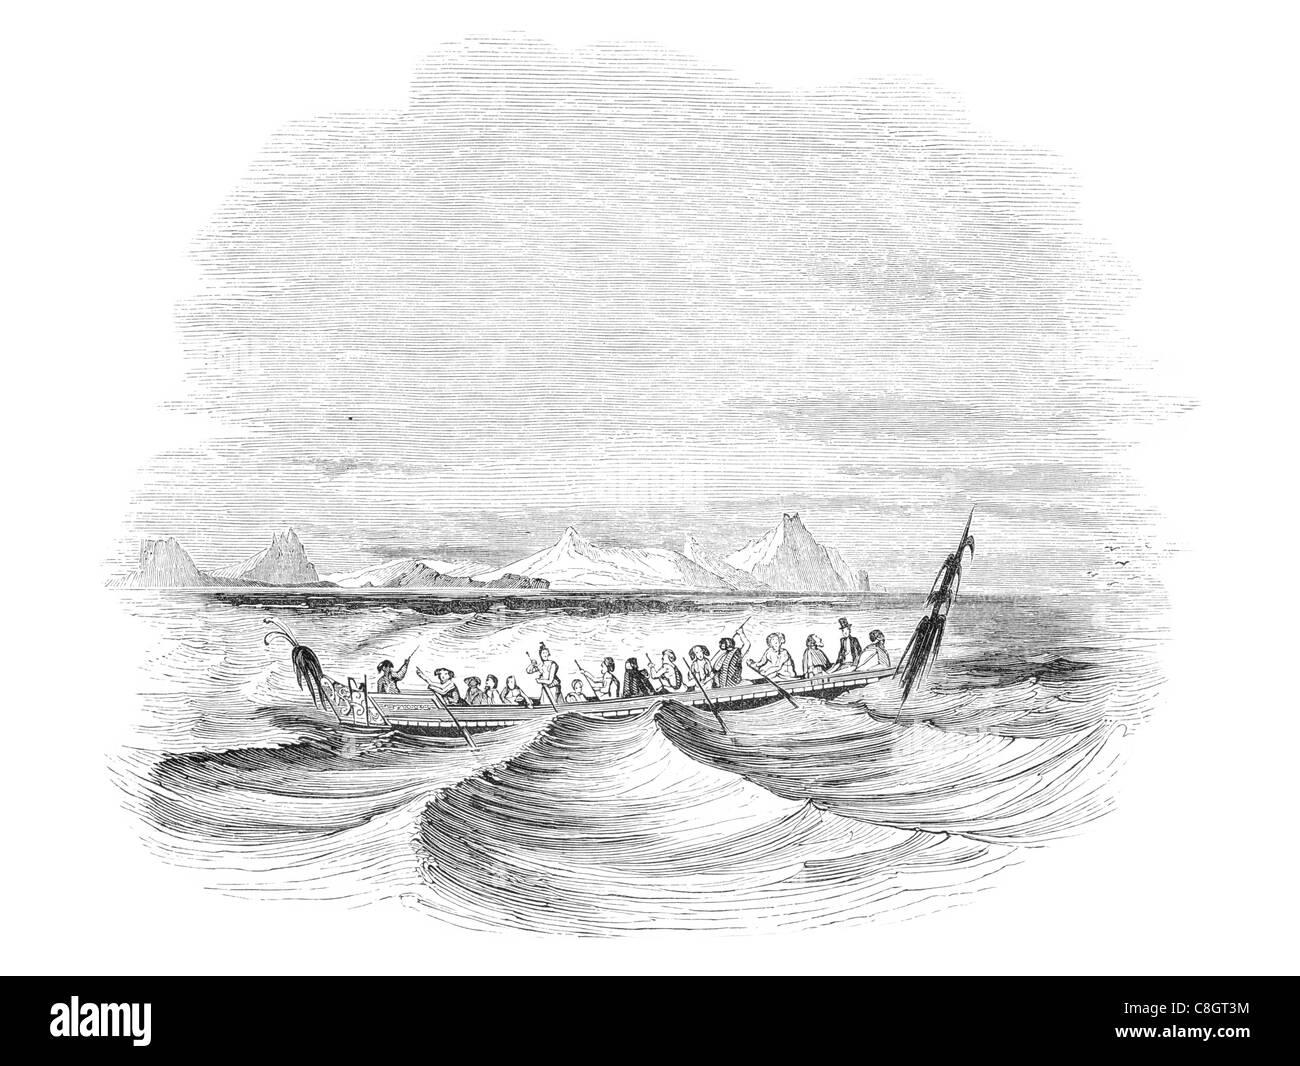 Cape Wangari New Zealand Māori tradition Kurahaupō canoe kayak paddle paddles rowing hull sailor ship ships shipping - Stock Image